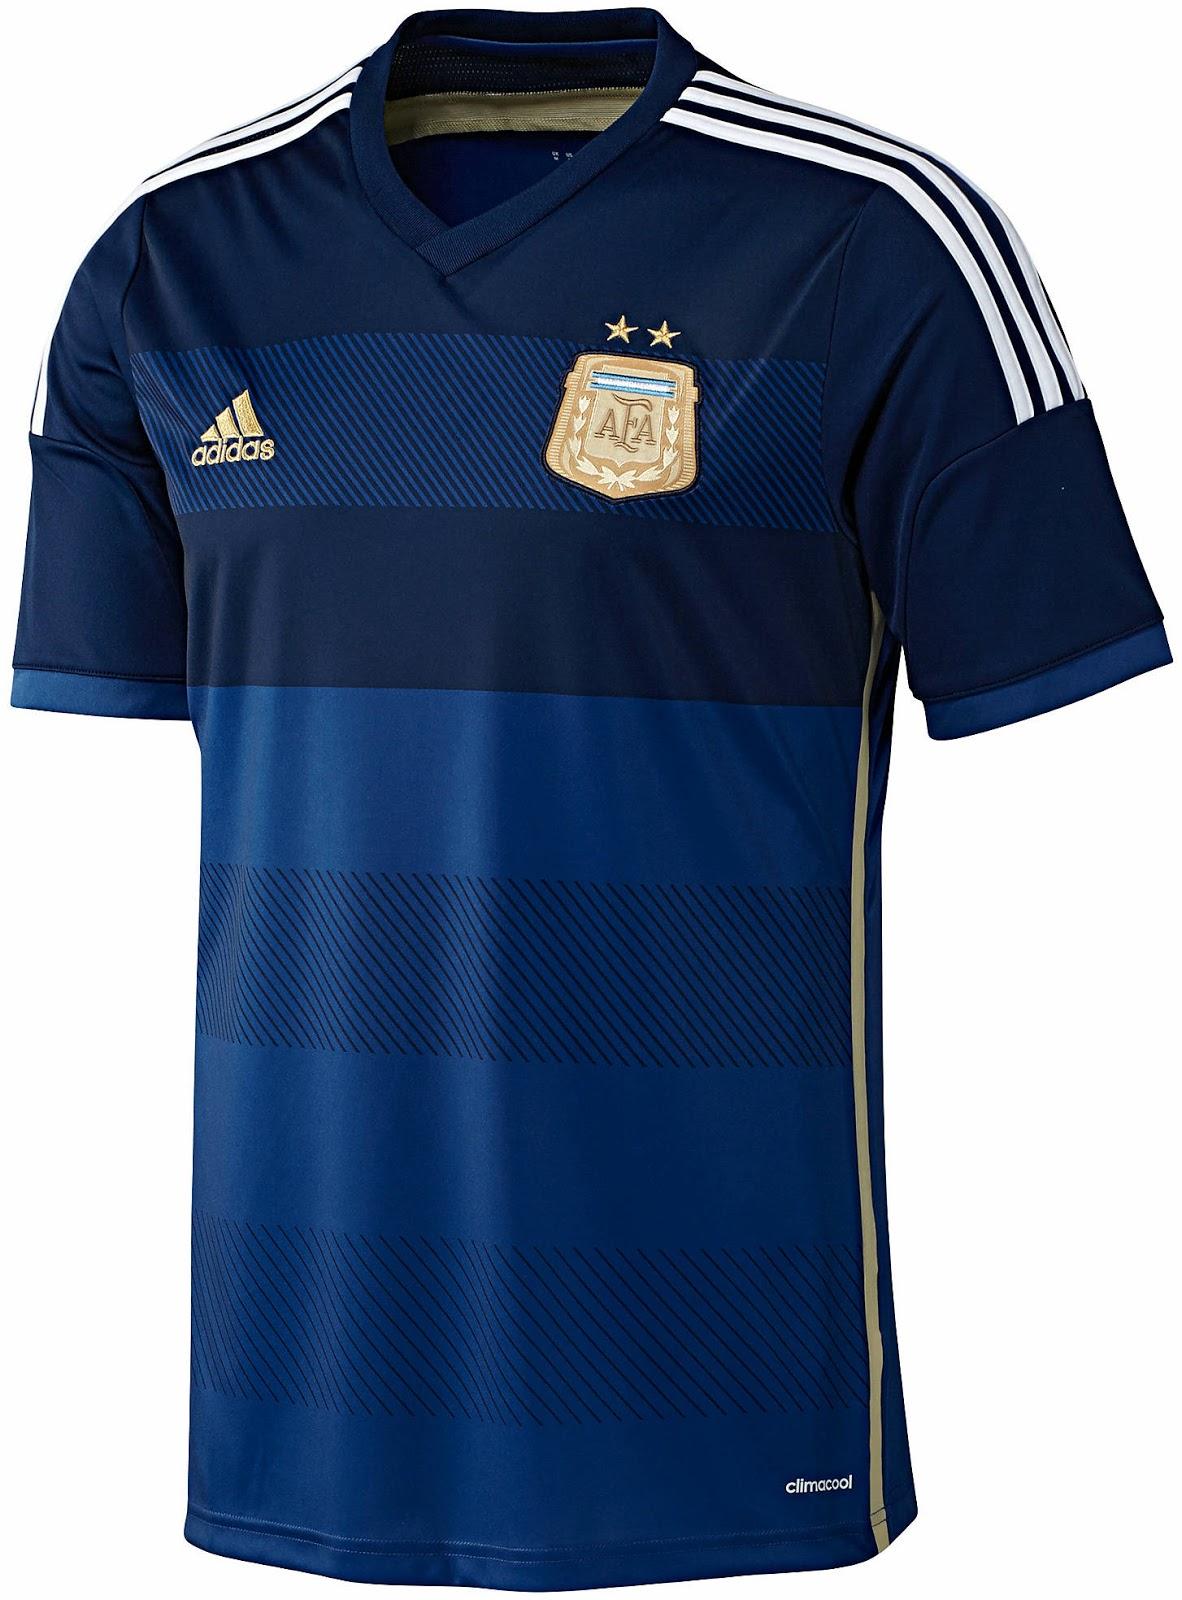 Argentina Flag Jersey